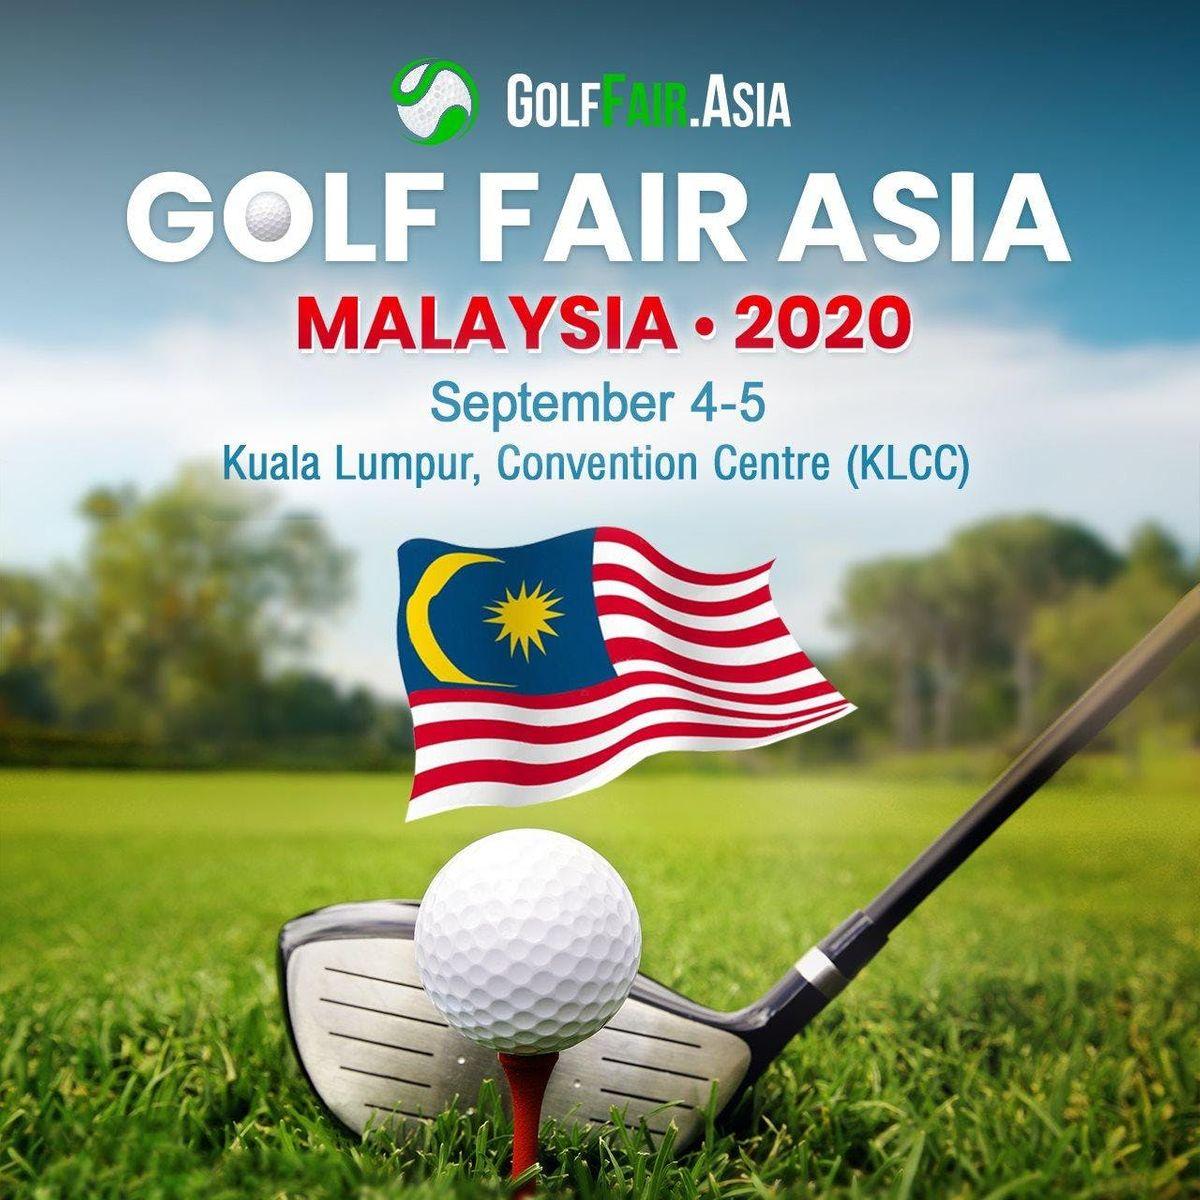 Golf Fair Asia 2020 - Malaysia (We invite Thailand)